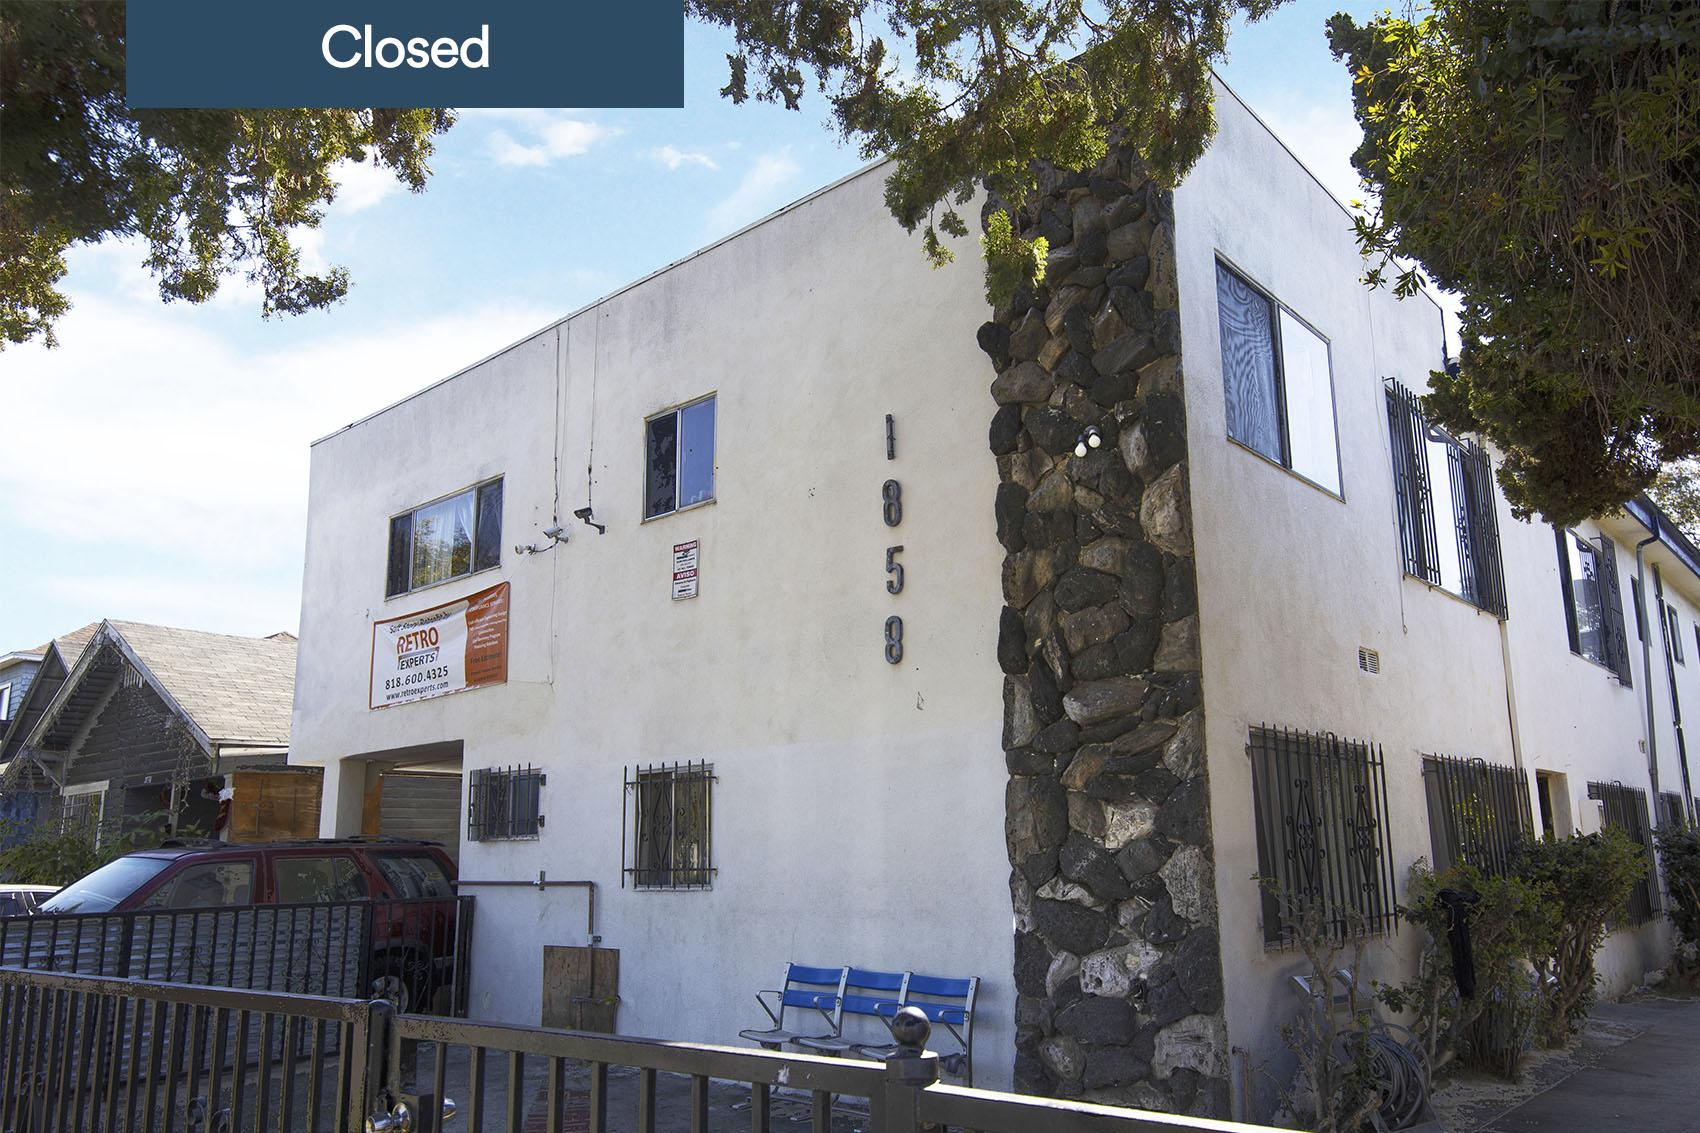 1858 20th - Closed.jpg